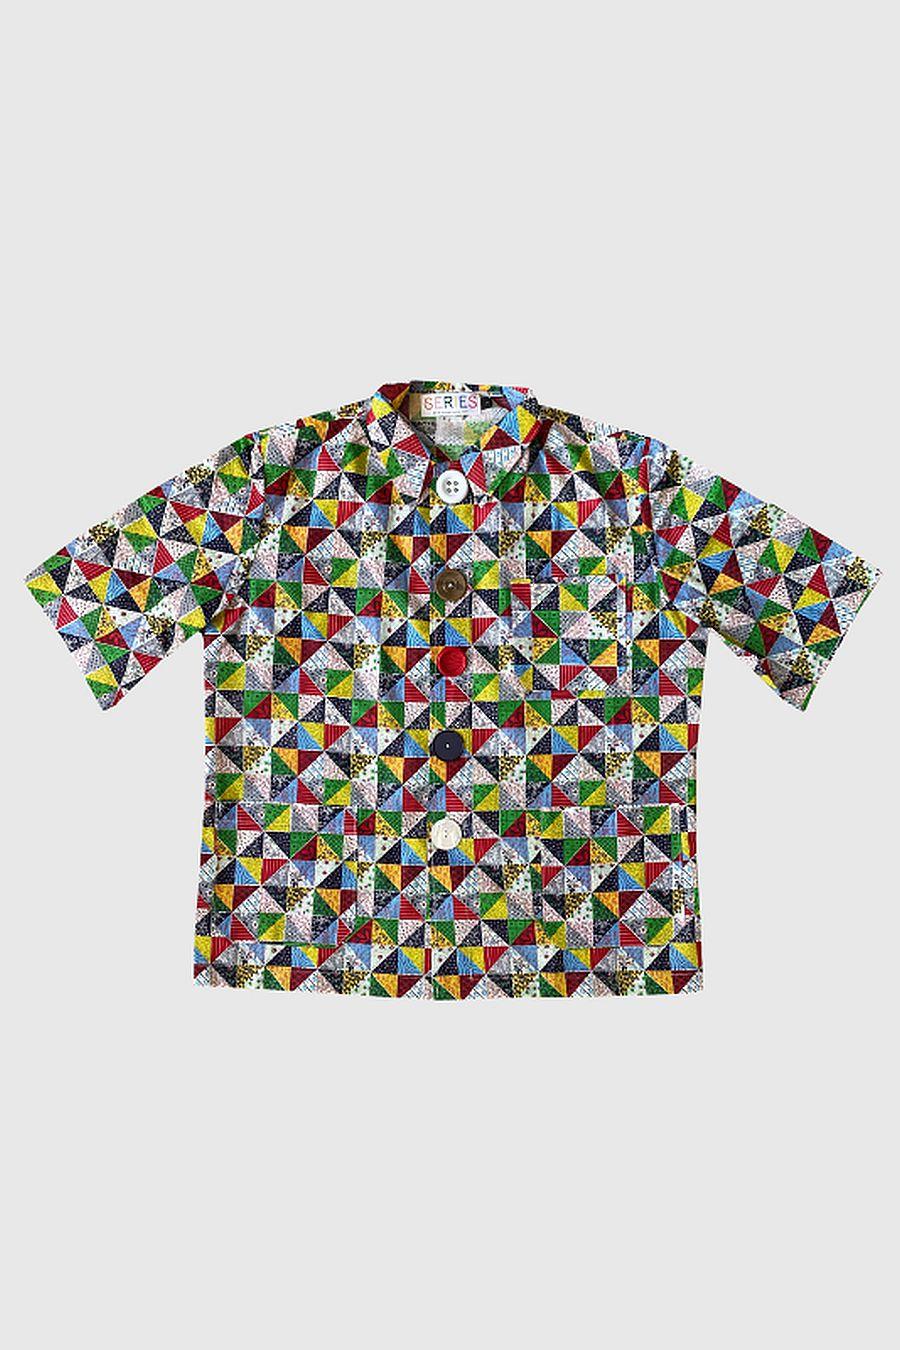 The Series NY Chore Shirt - CSCH002